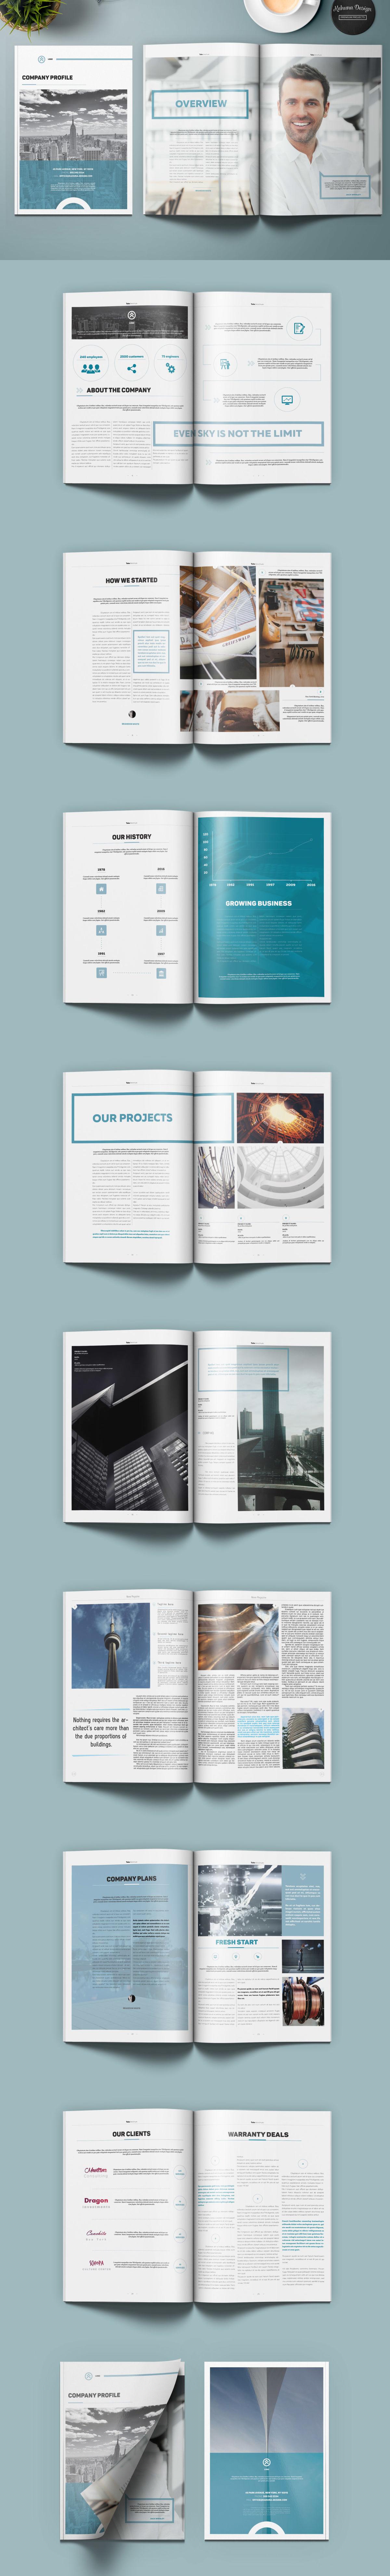 Tako Company Profile Brochure Template InDesign INDD … | Pinterest